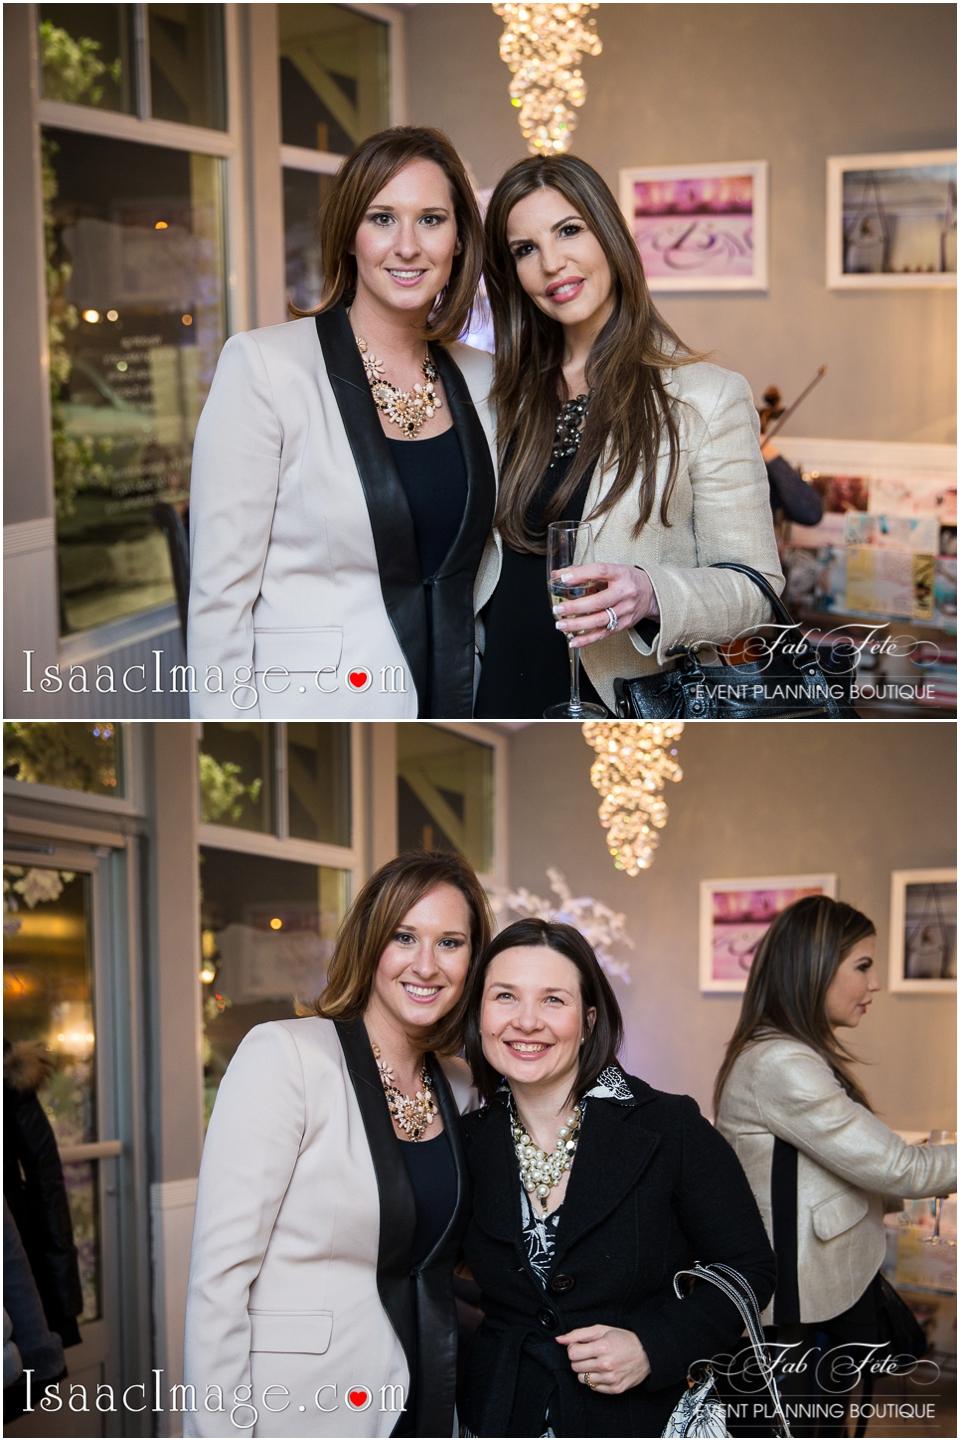 Fab Fete Toronto Wedding Event Planning Boutique open house_6475.jpg